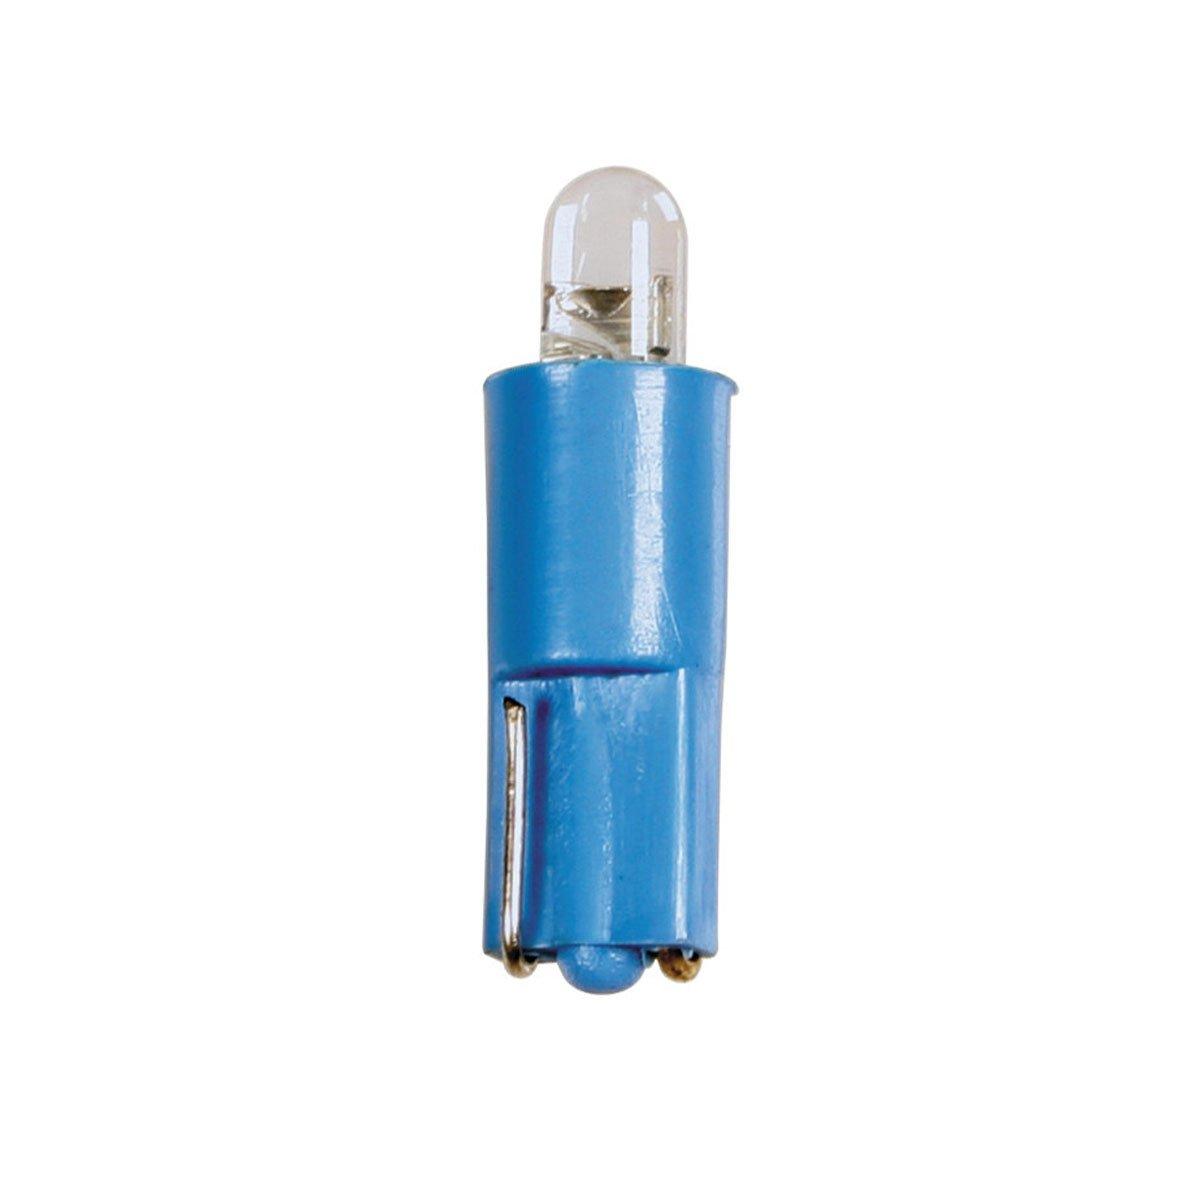 Lampa 58489 Set Lampade a LED per Cruscotto, T3, 3 mm, Bianco LA_58489